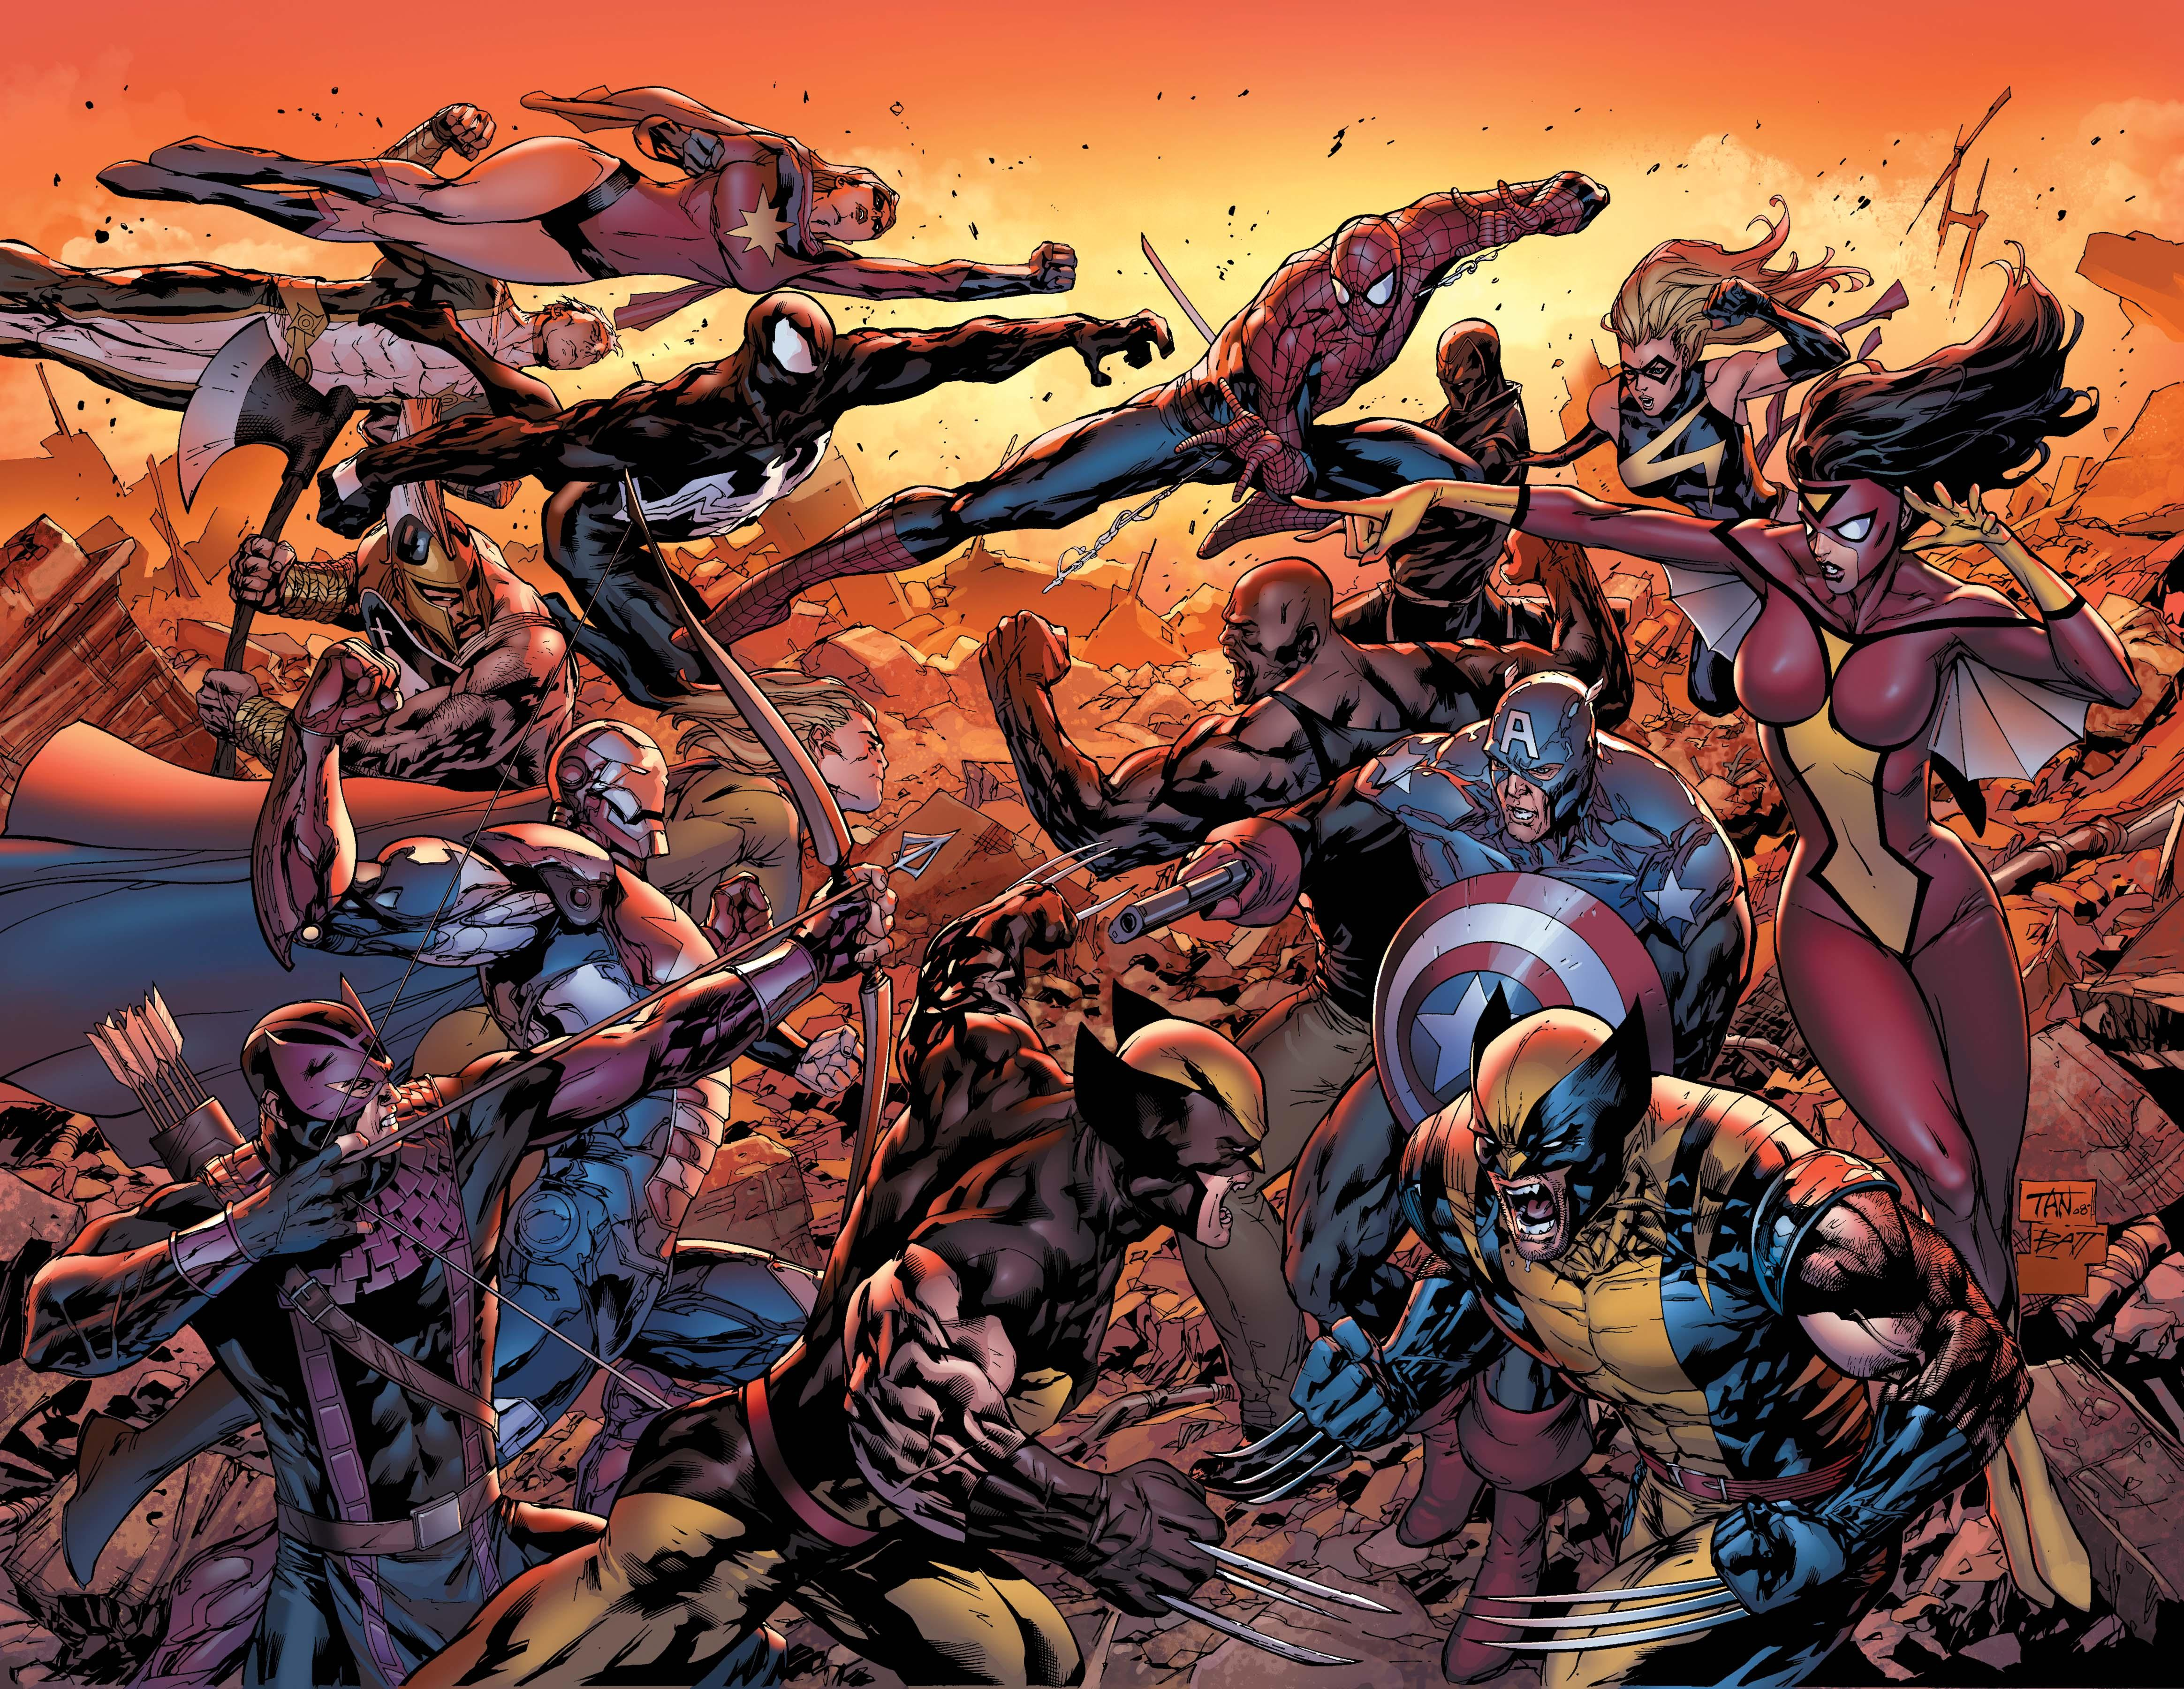 New Avengers Vol 1 50 Textless Wraparound.jpg